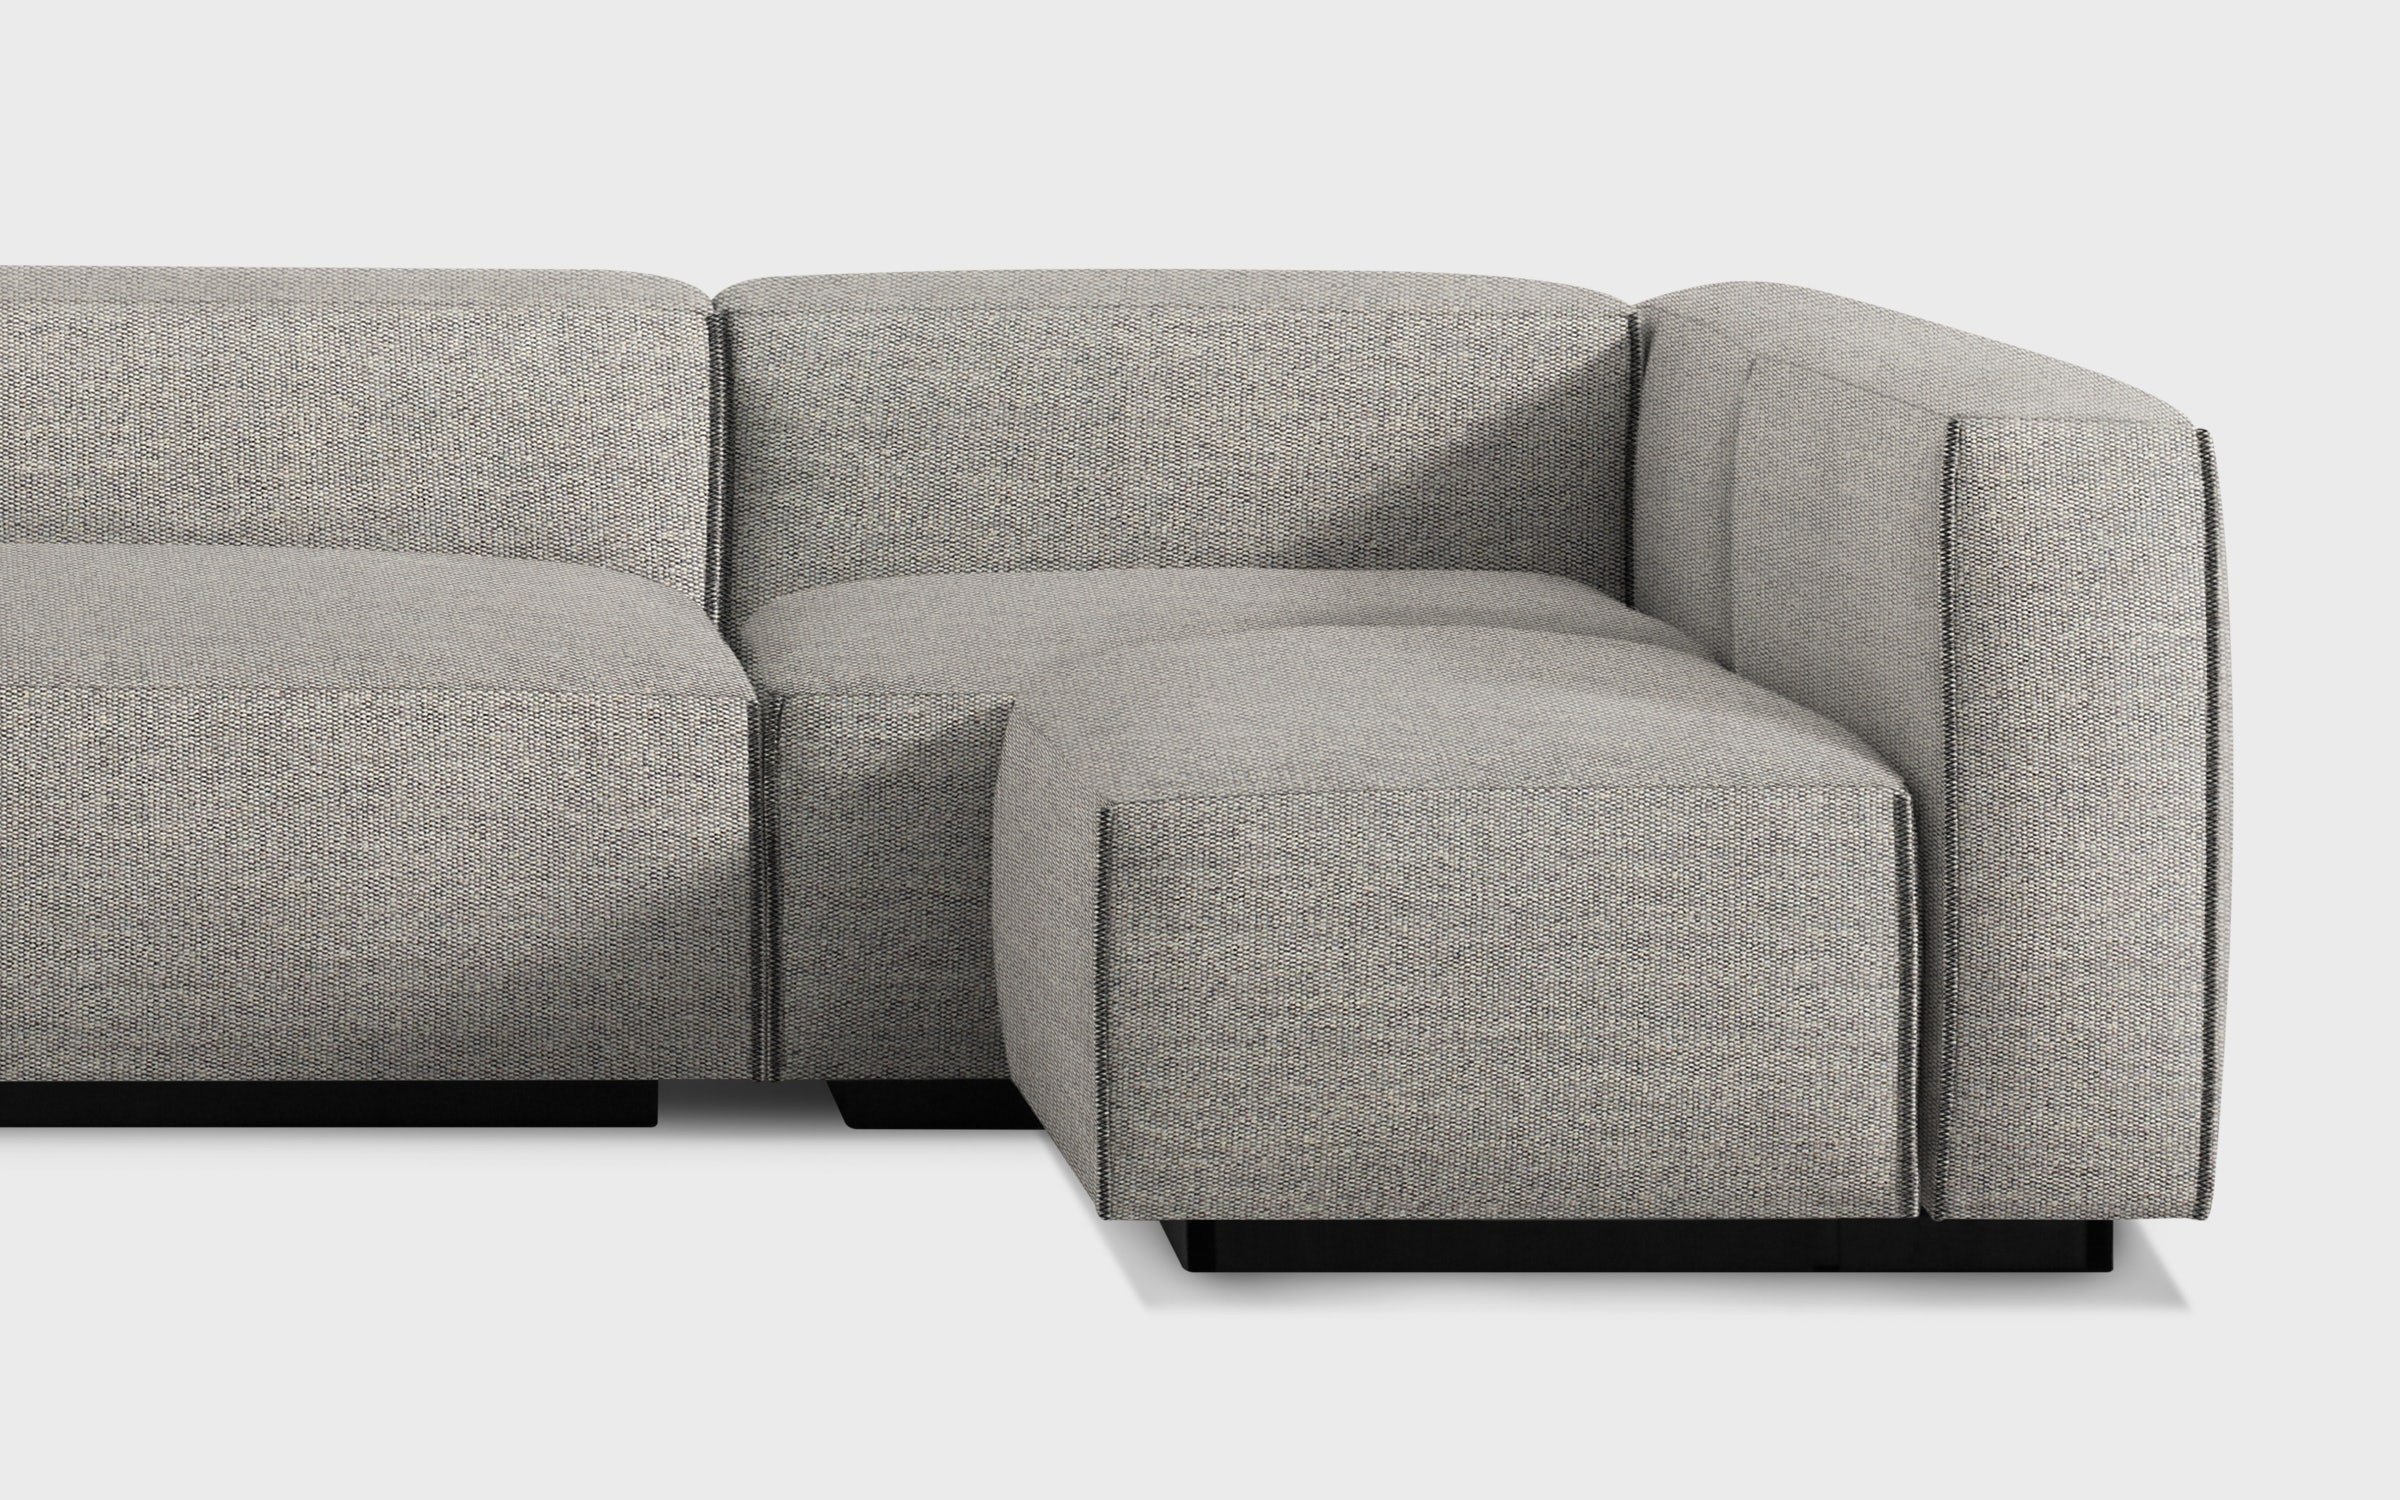 Cleon Medium Sectional Sofa